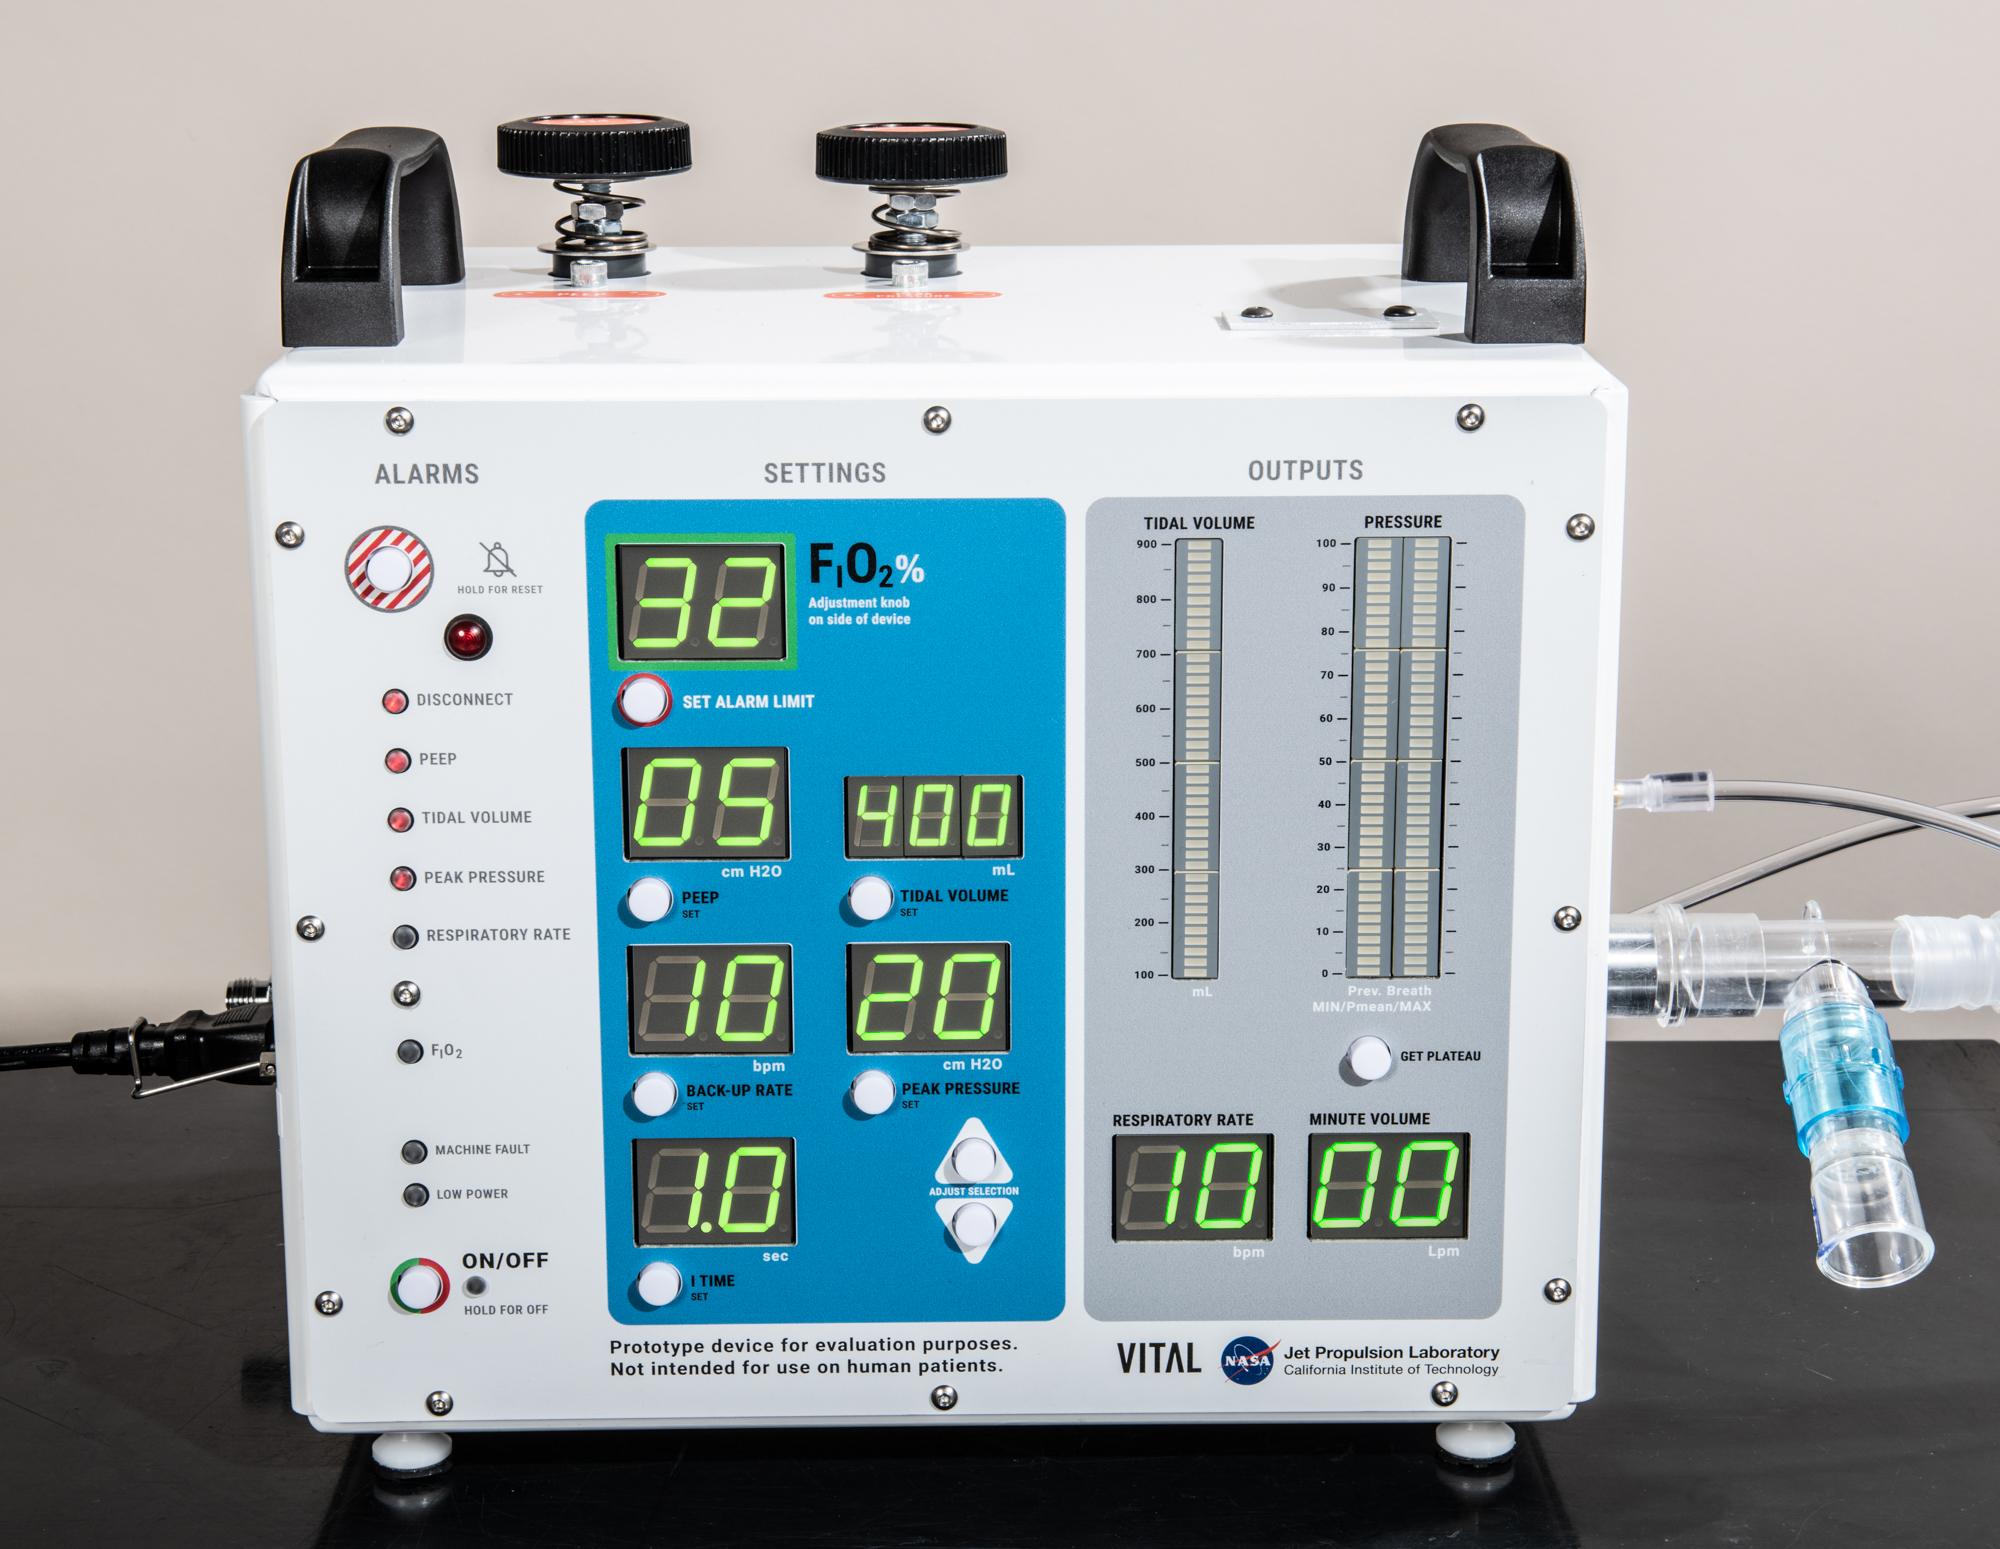 NASA-Developed Ventilator Authorized by FDA for Emergency Use | NASA